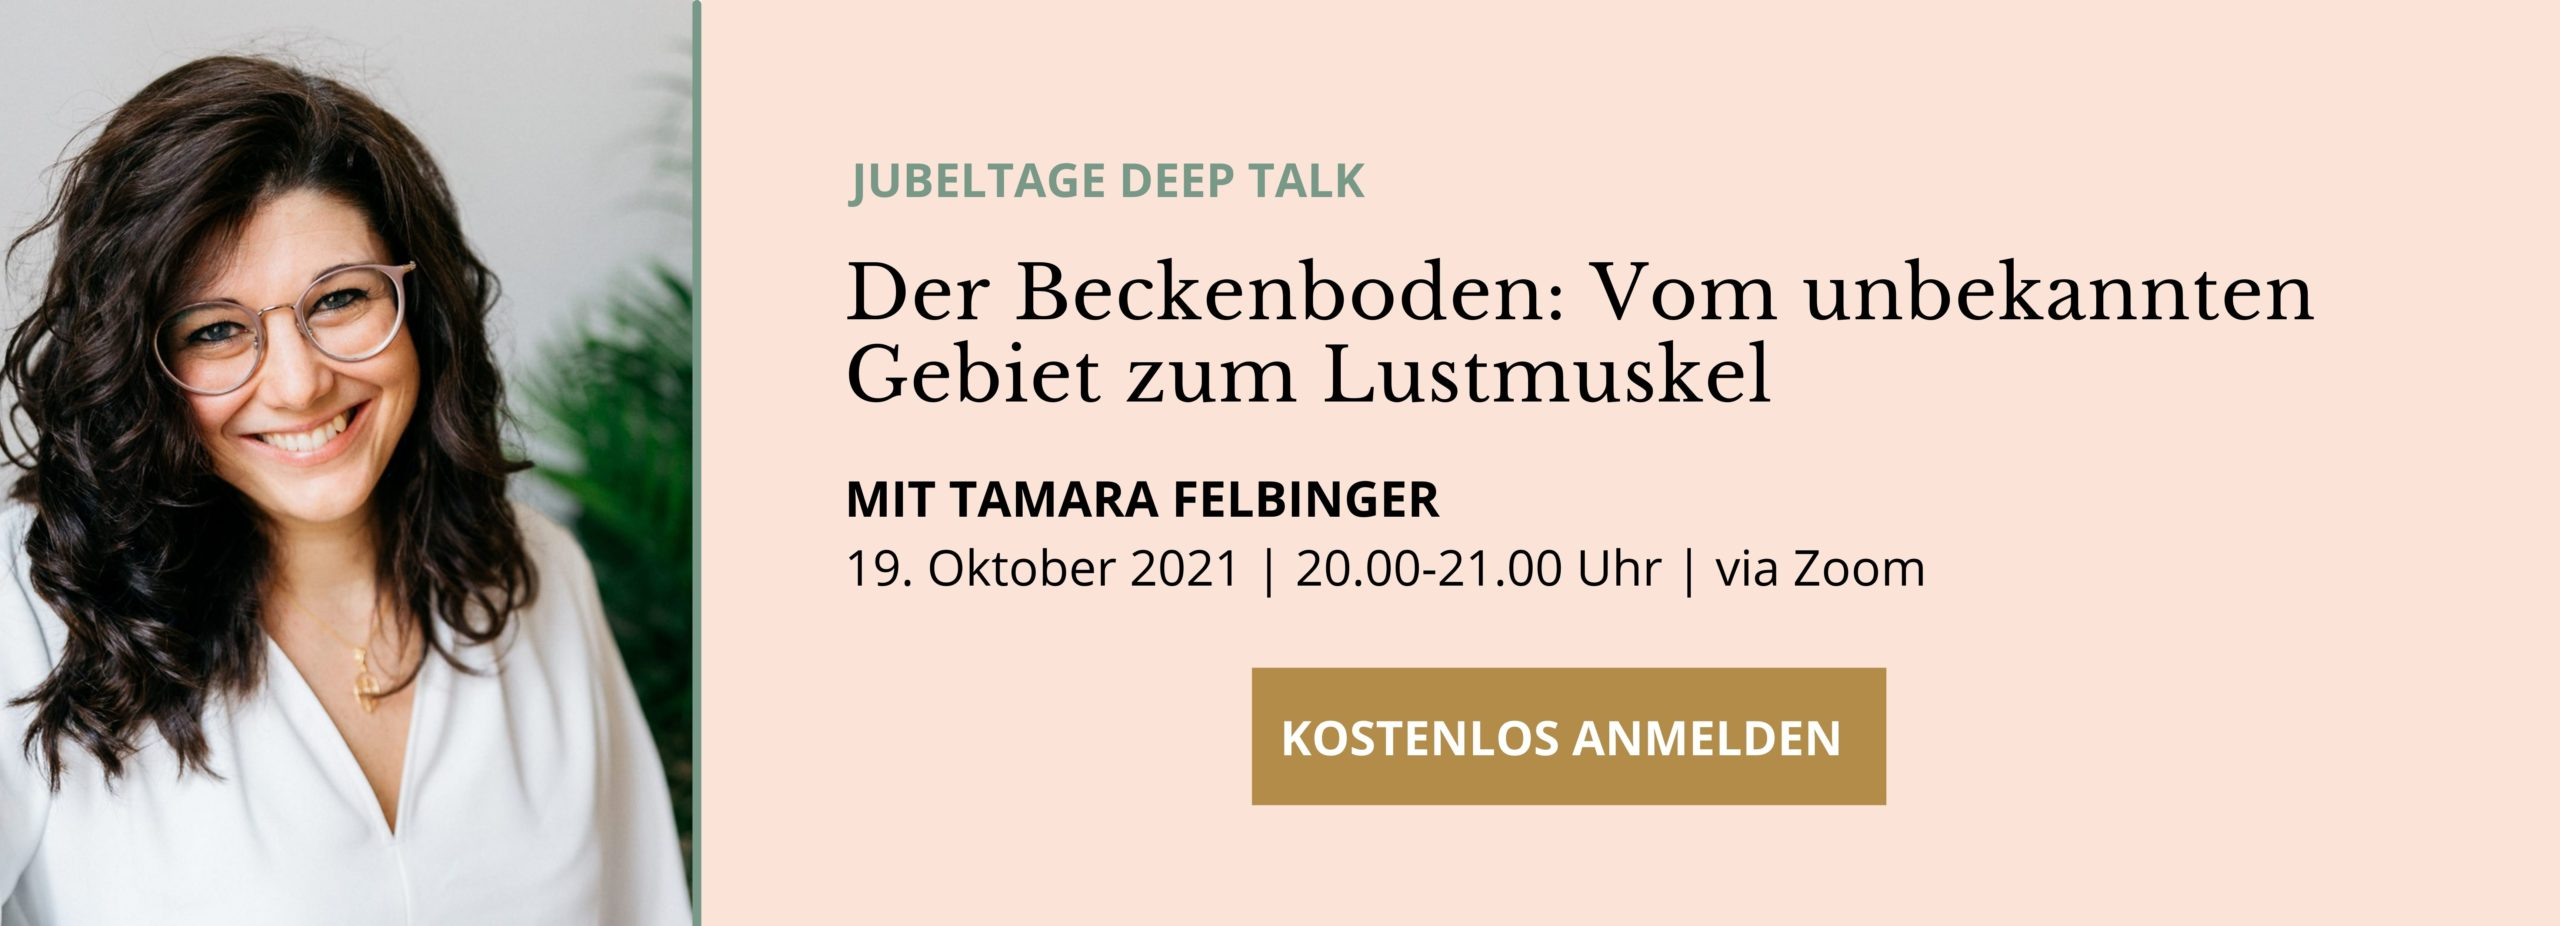 Jubeltage Deep Talk